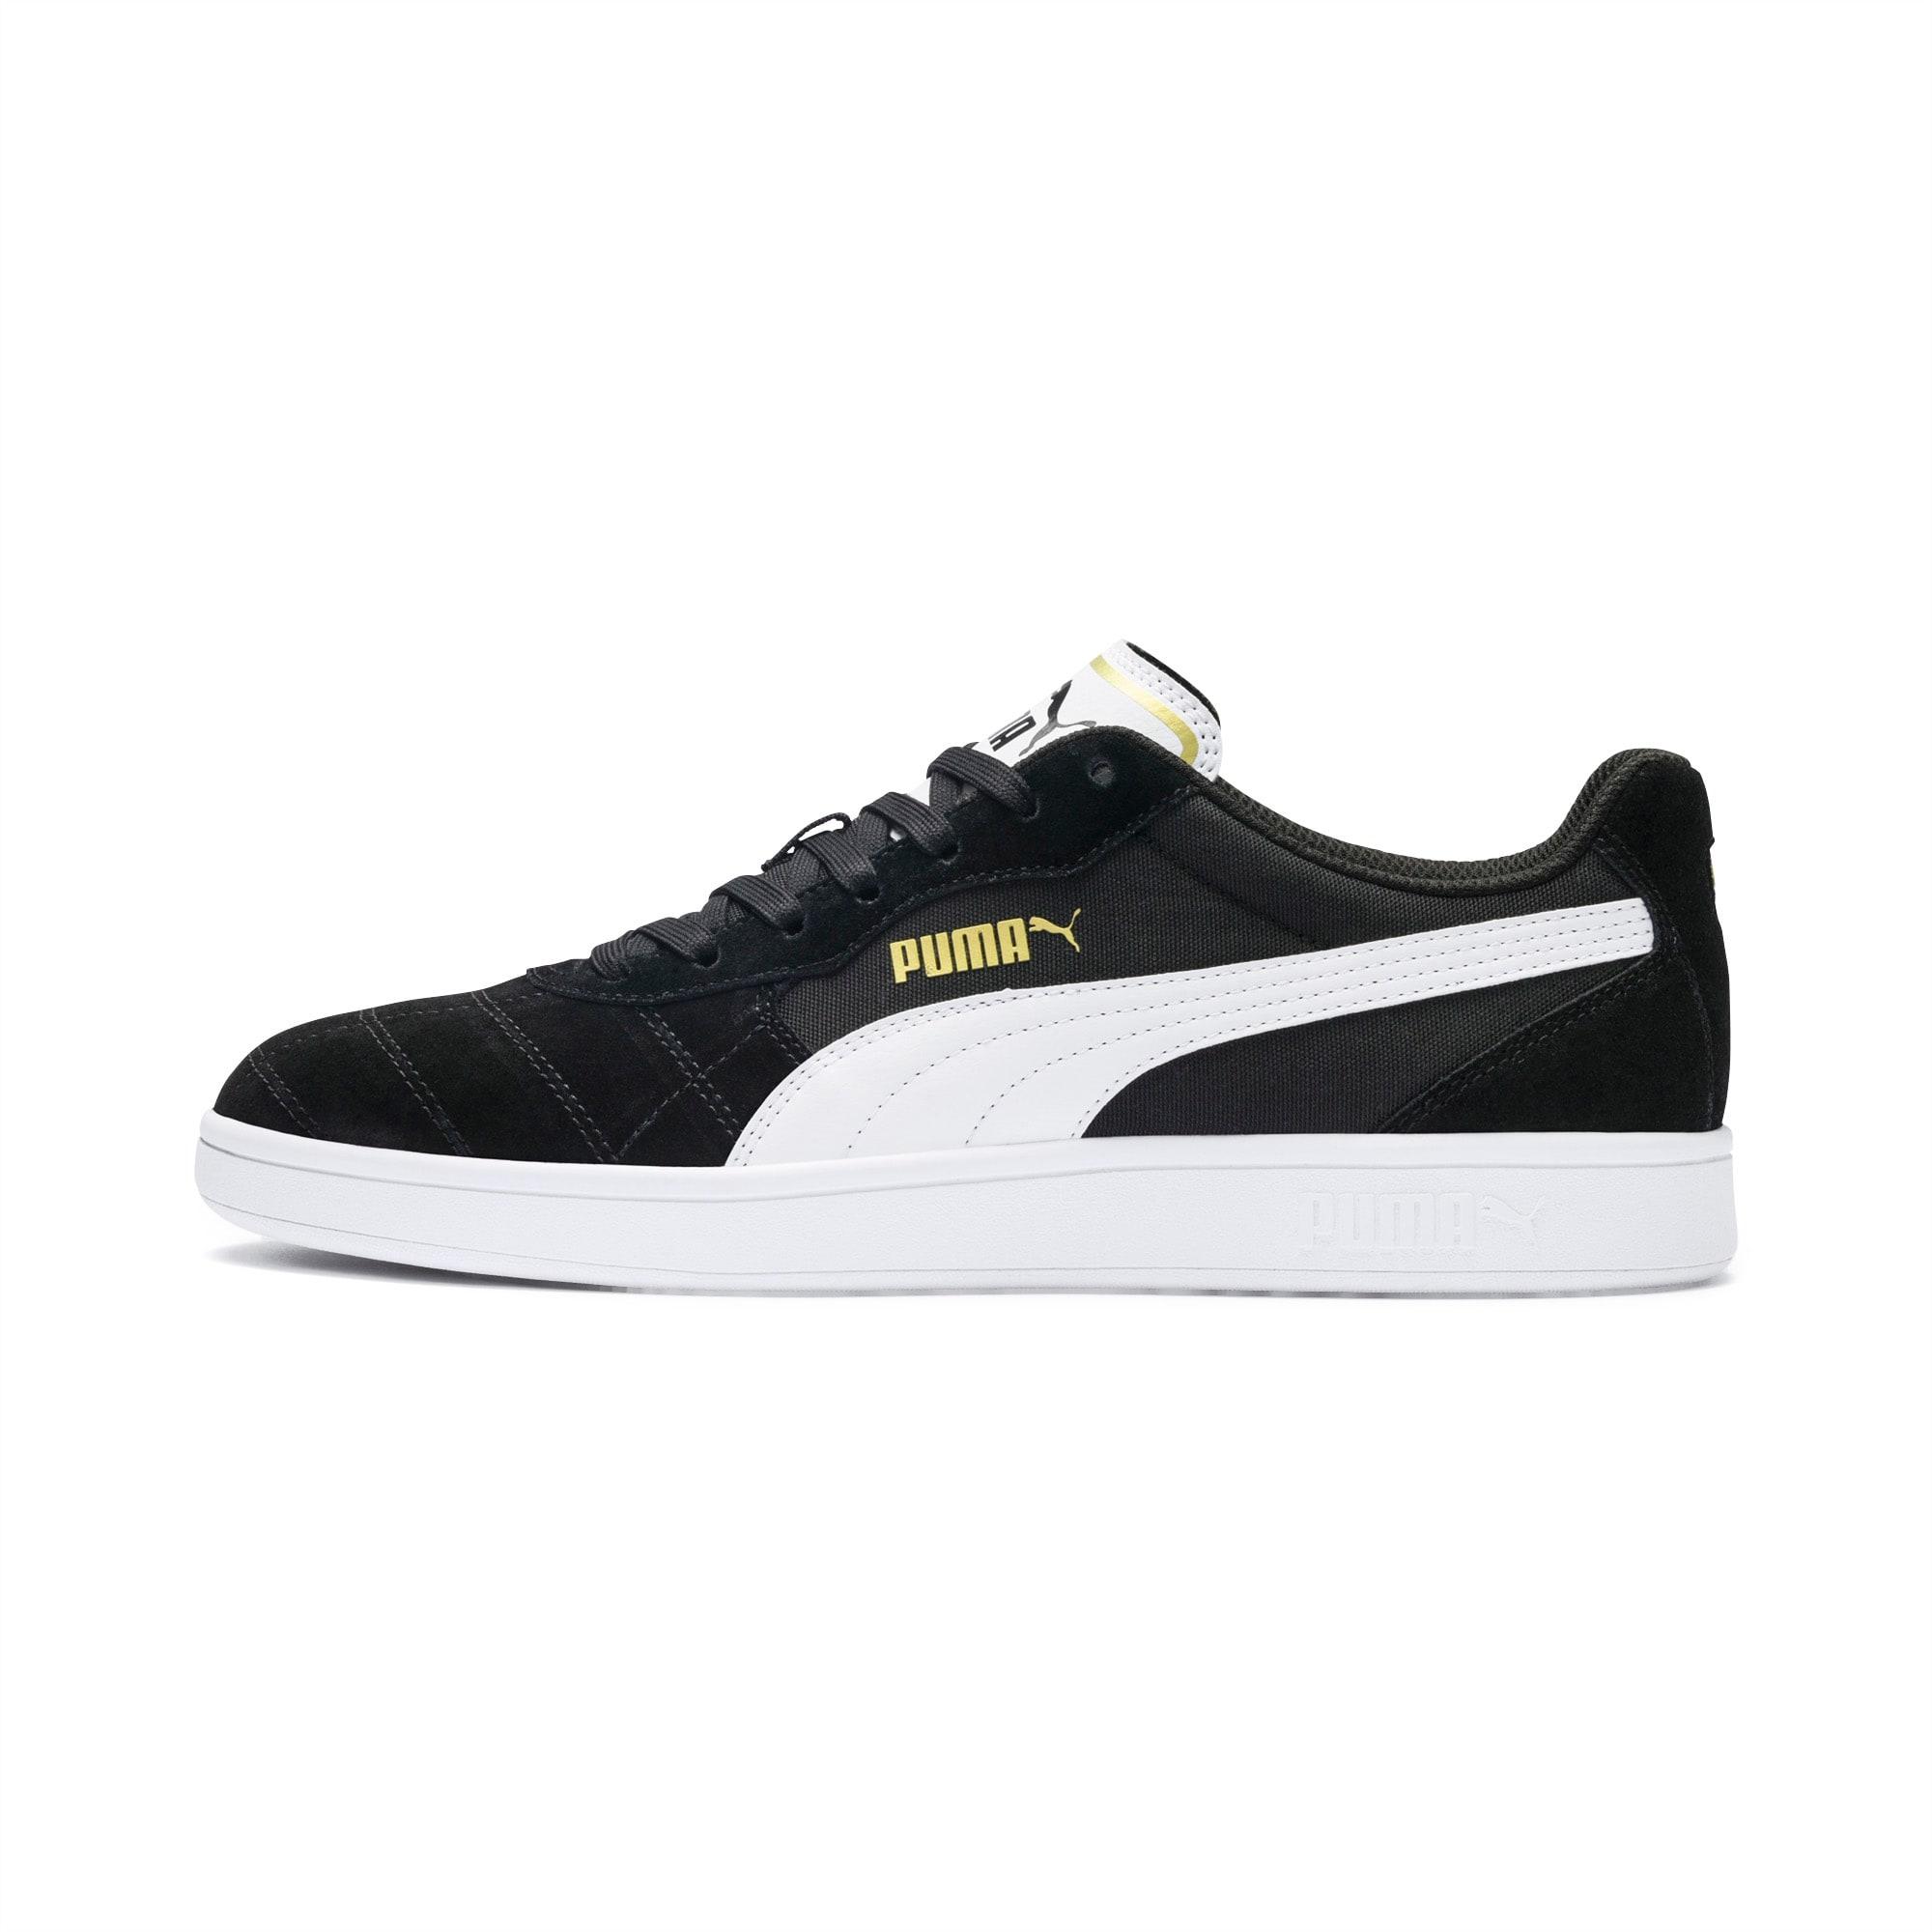 Astro Kick Men's Sneakers, Puma Black-Puma White, extralarge